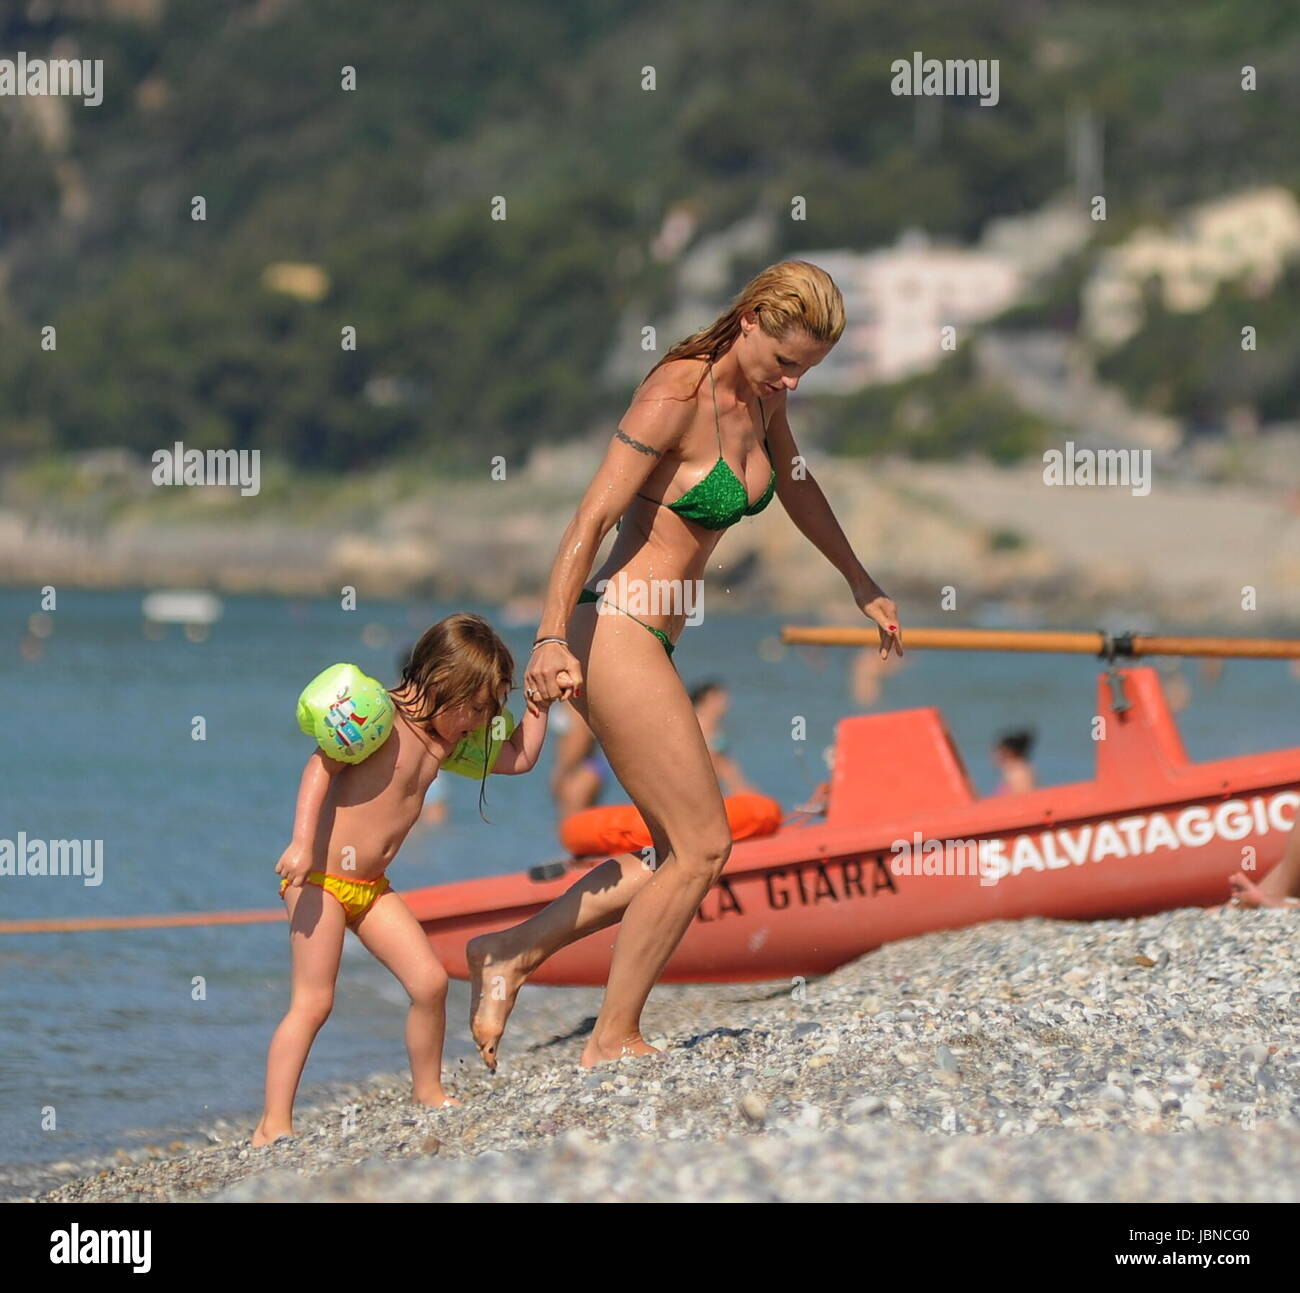 GALLERY Deborah Harry,Ariel winter leggy Porno picture Edita vilkeviciute by solve sundsbo,Emily ratajkowski feet